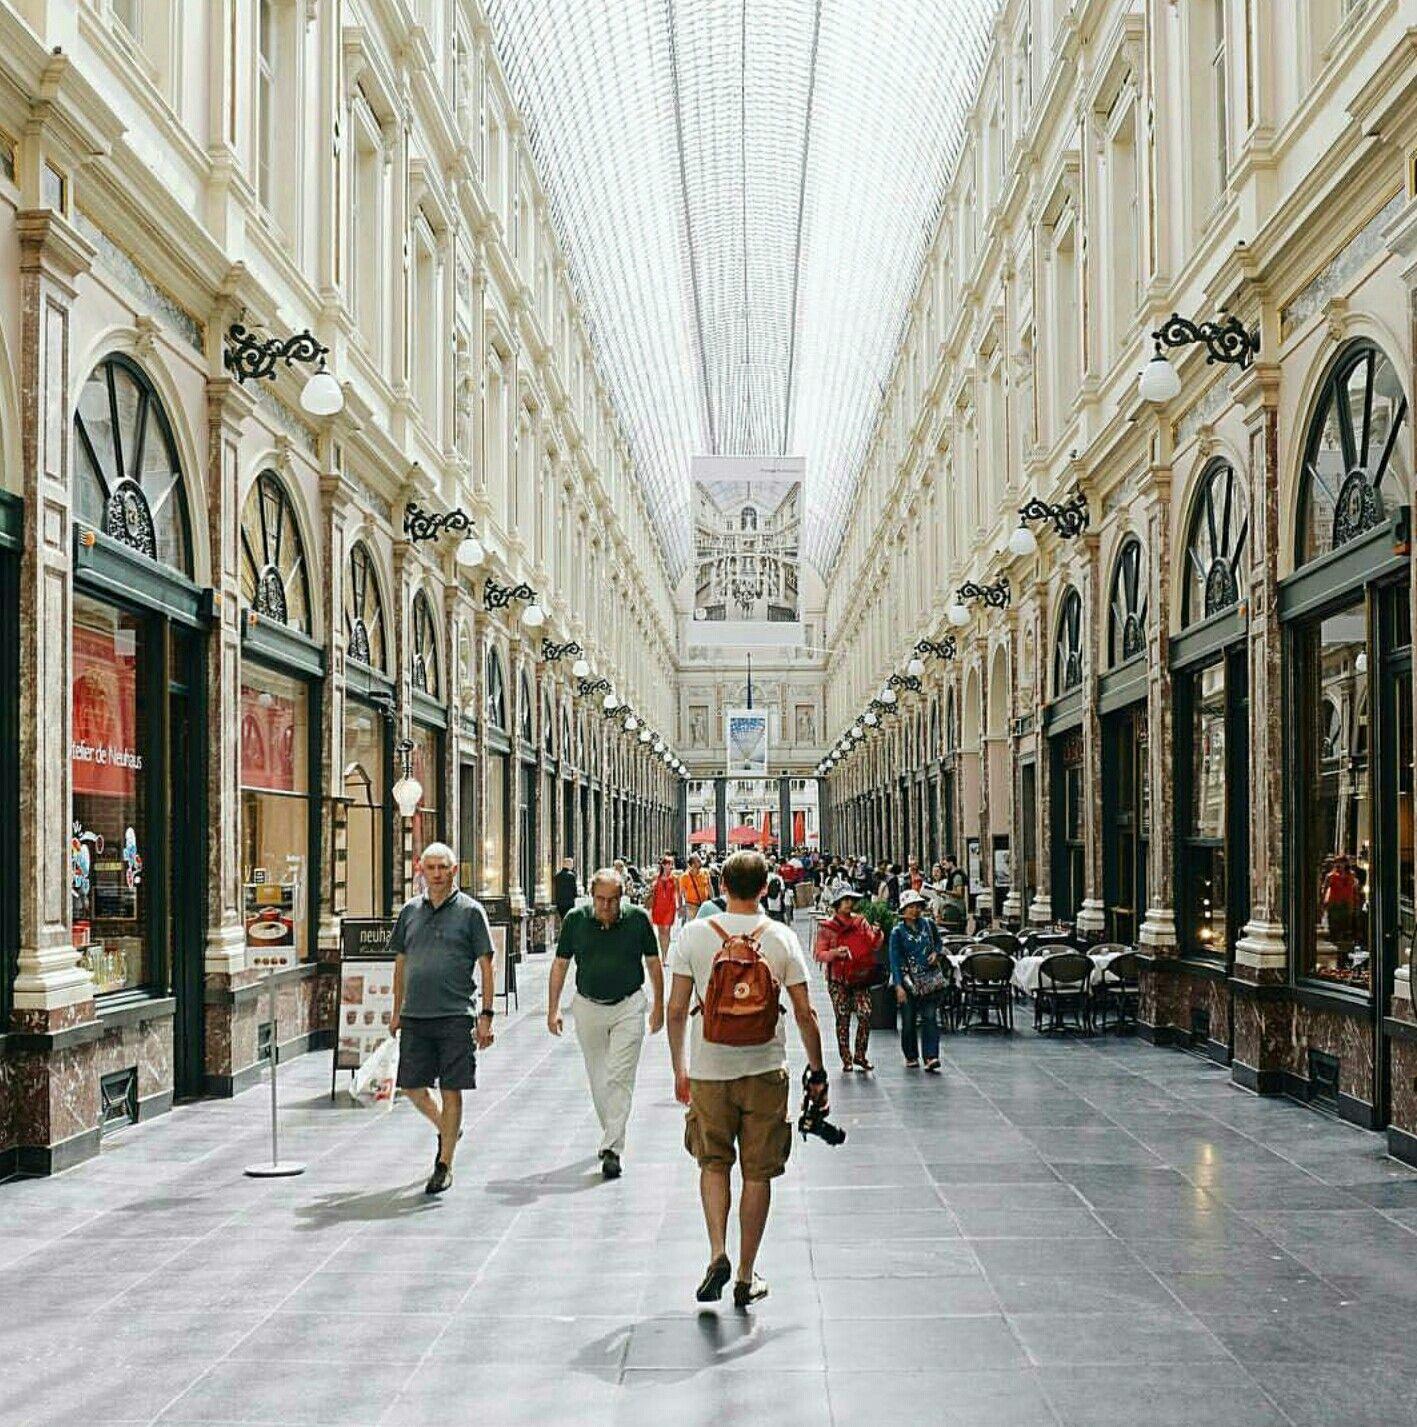 Galeries Royales Saint Hubert Koninklijke Sint Hubertusgalerijen Saint Hubert Breathtaking Places Street View